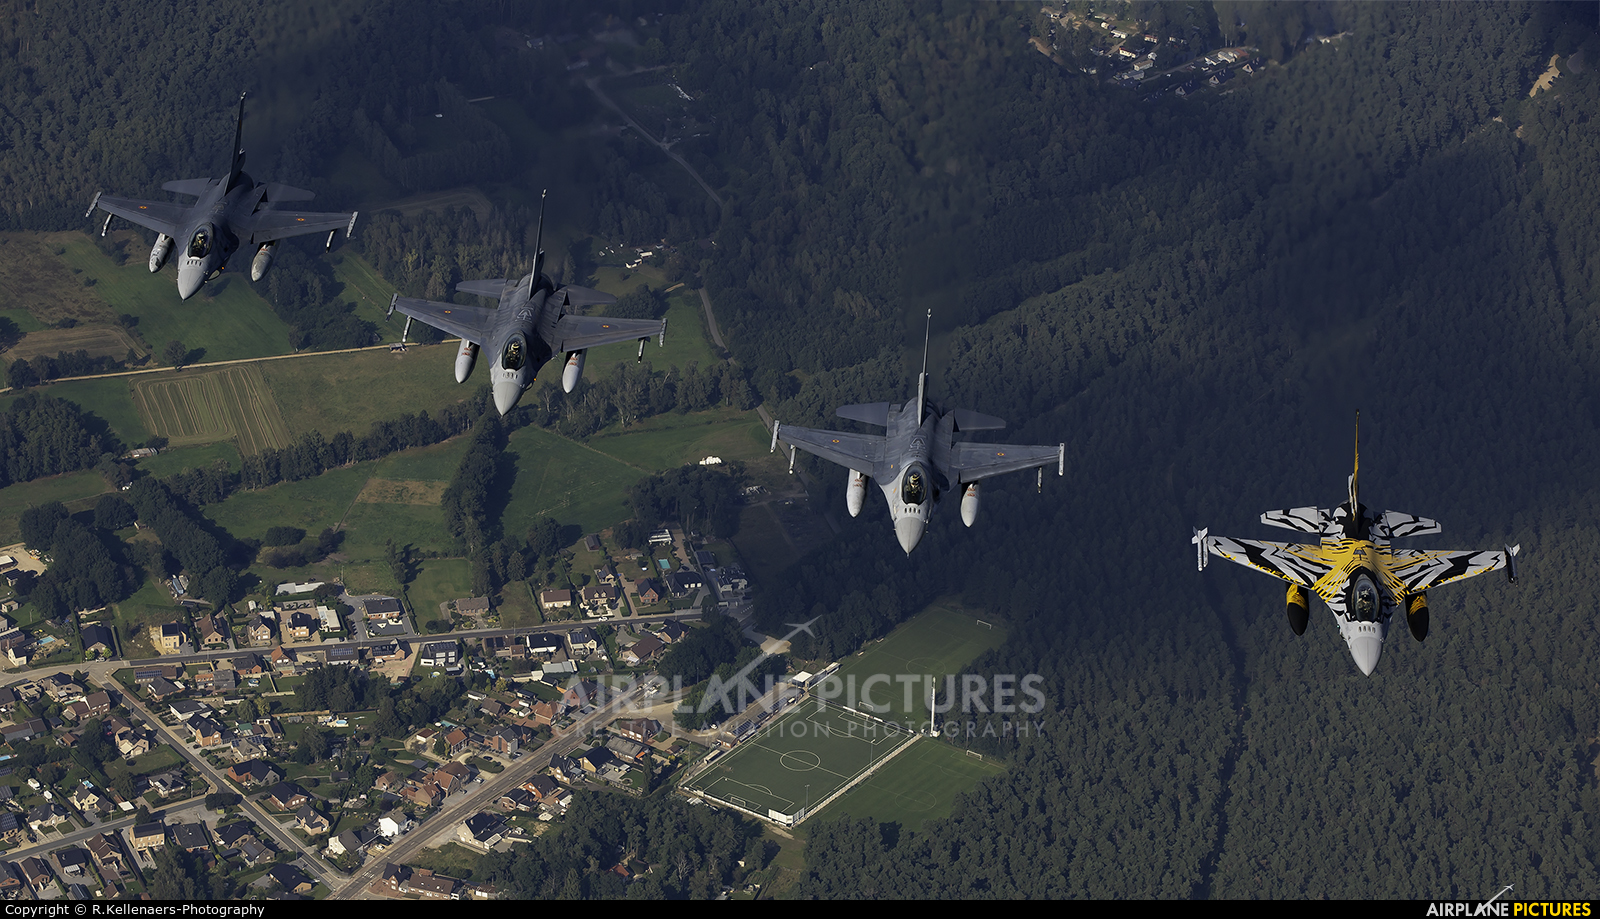 Belgium - Air Force FA-136 aircraft at In Flight - Belgium